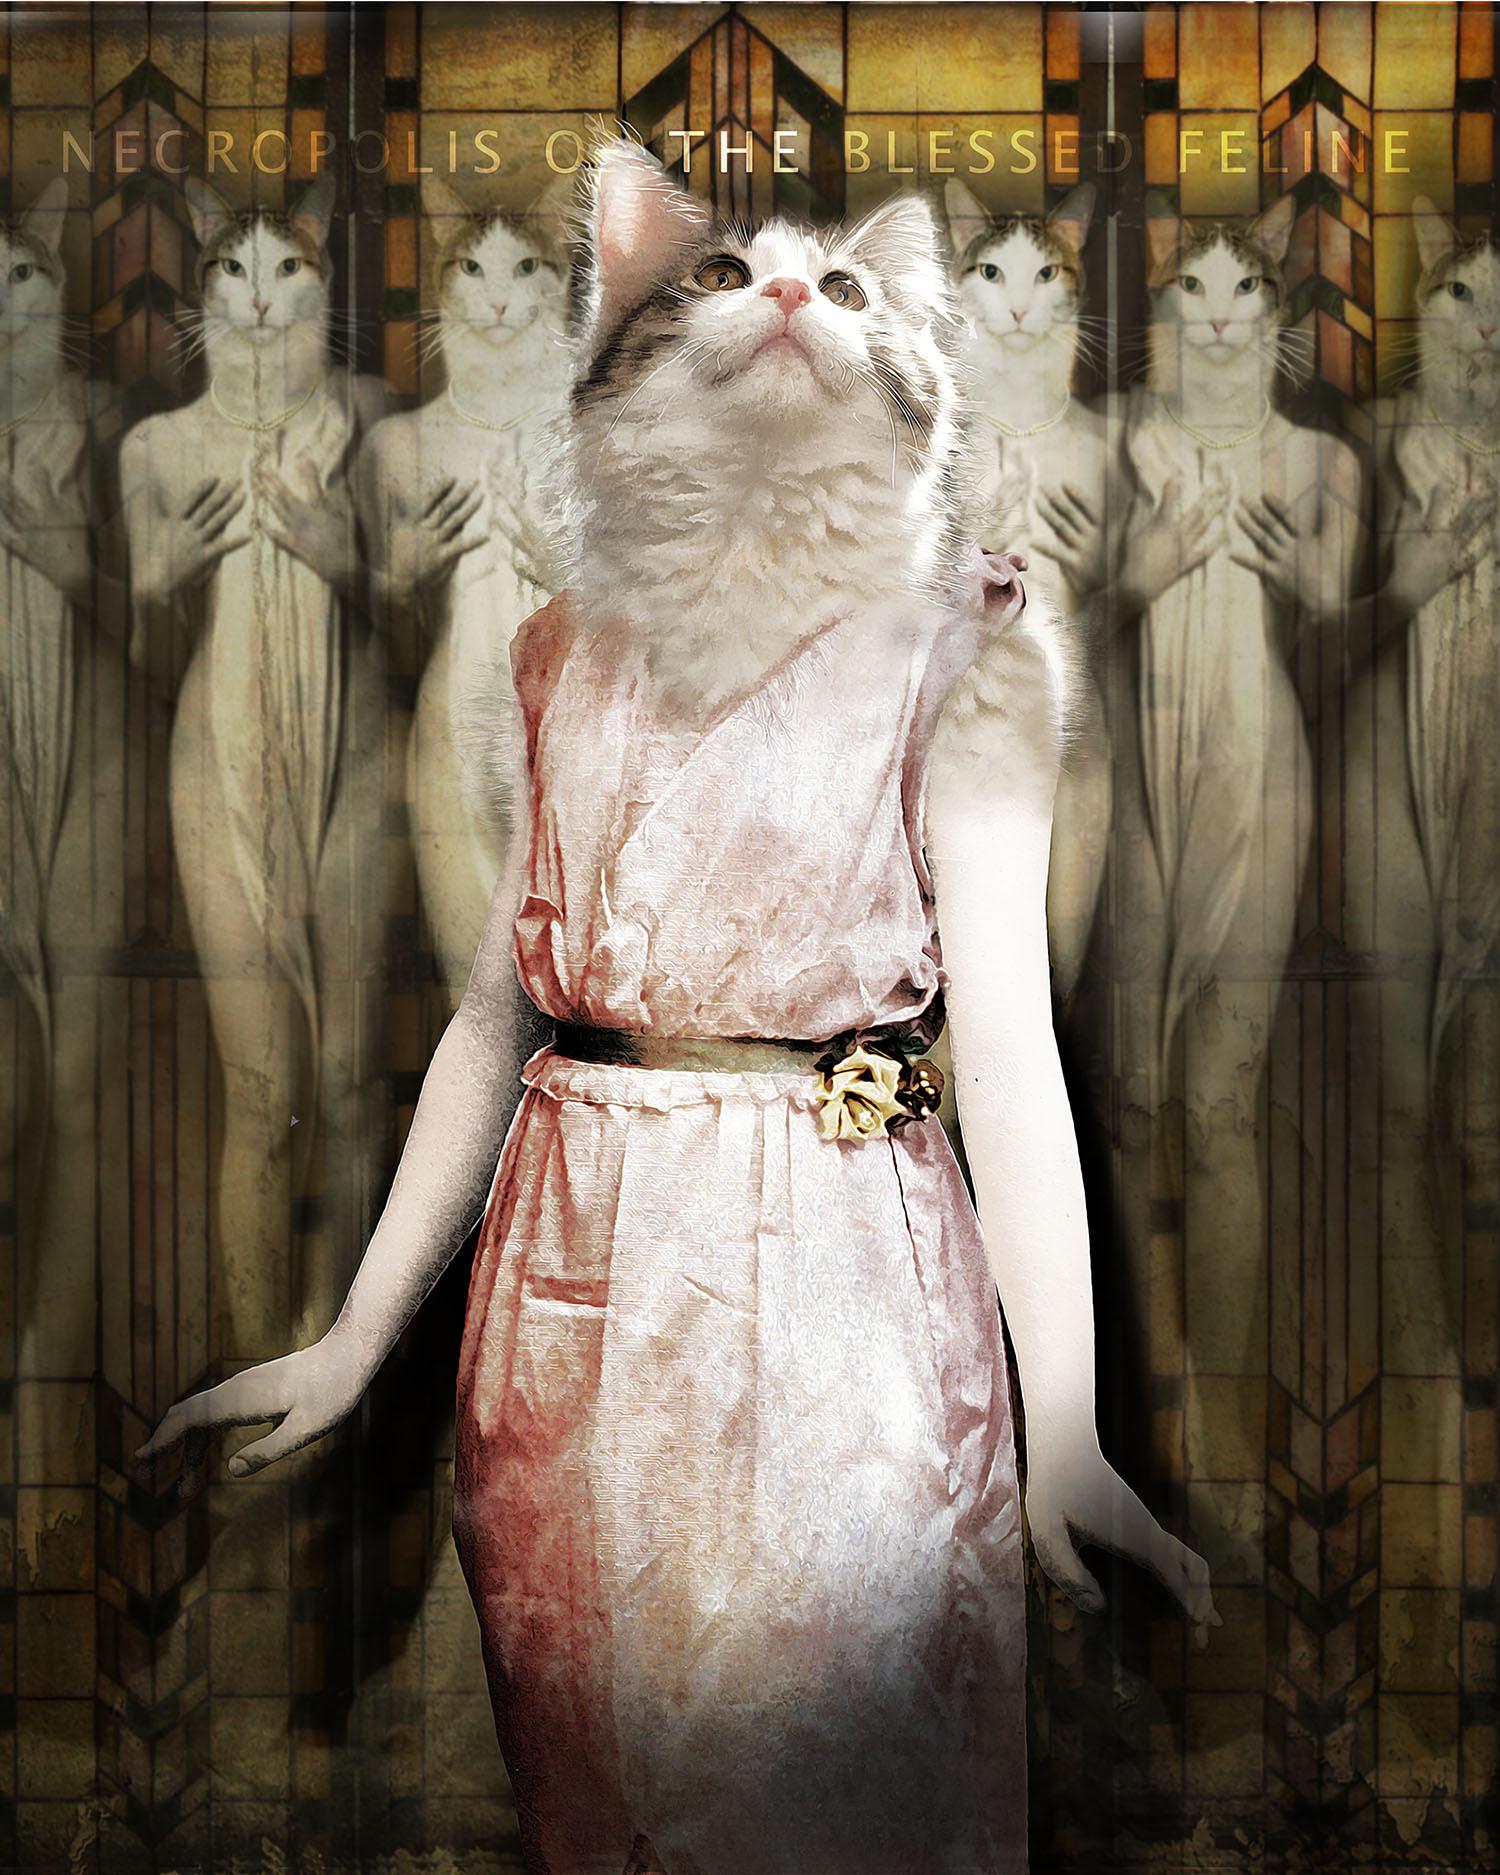 Necropolis of the Blessed Feline